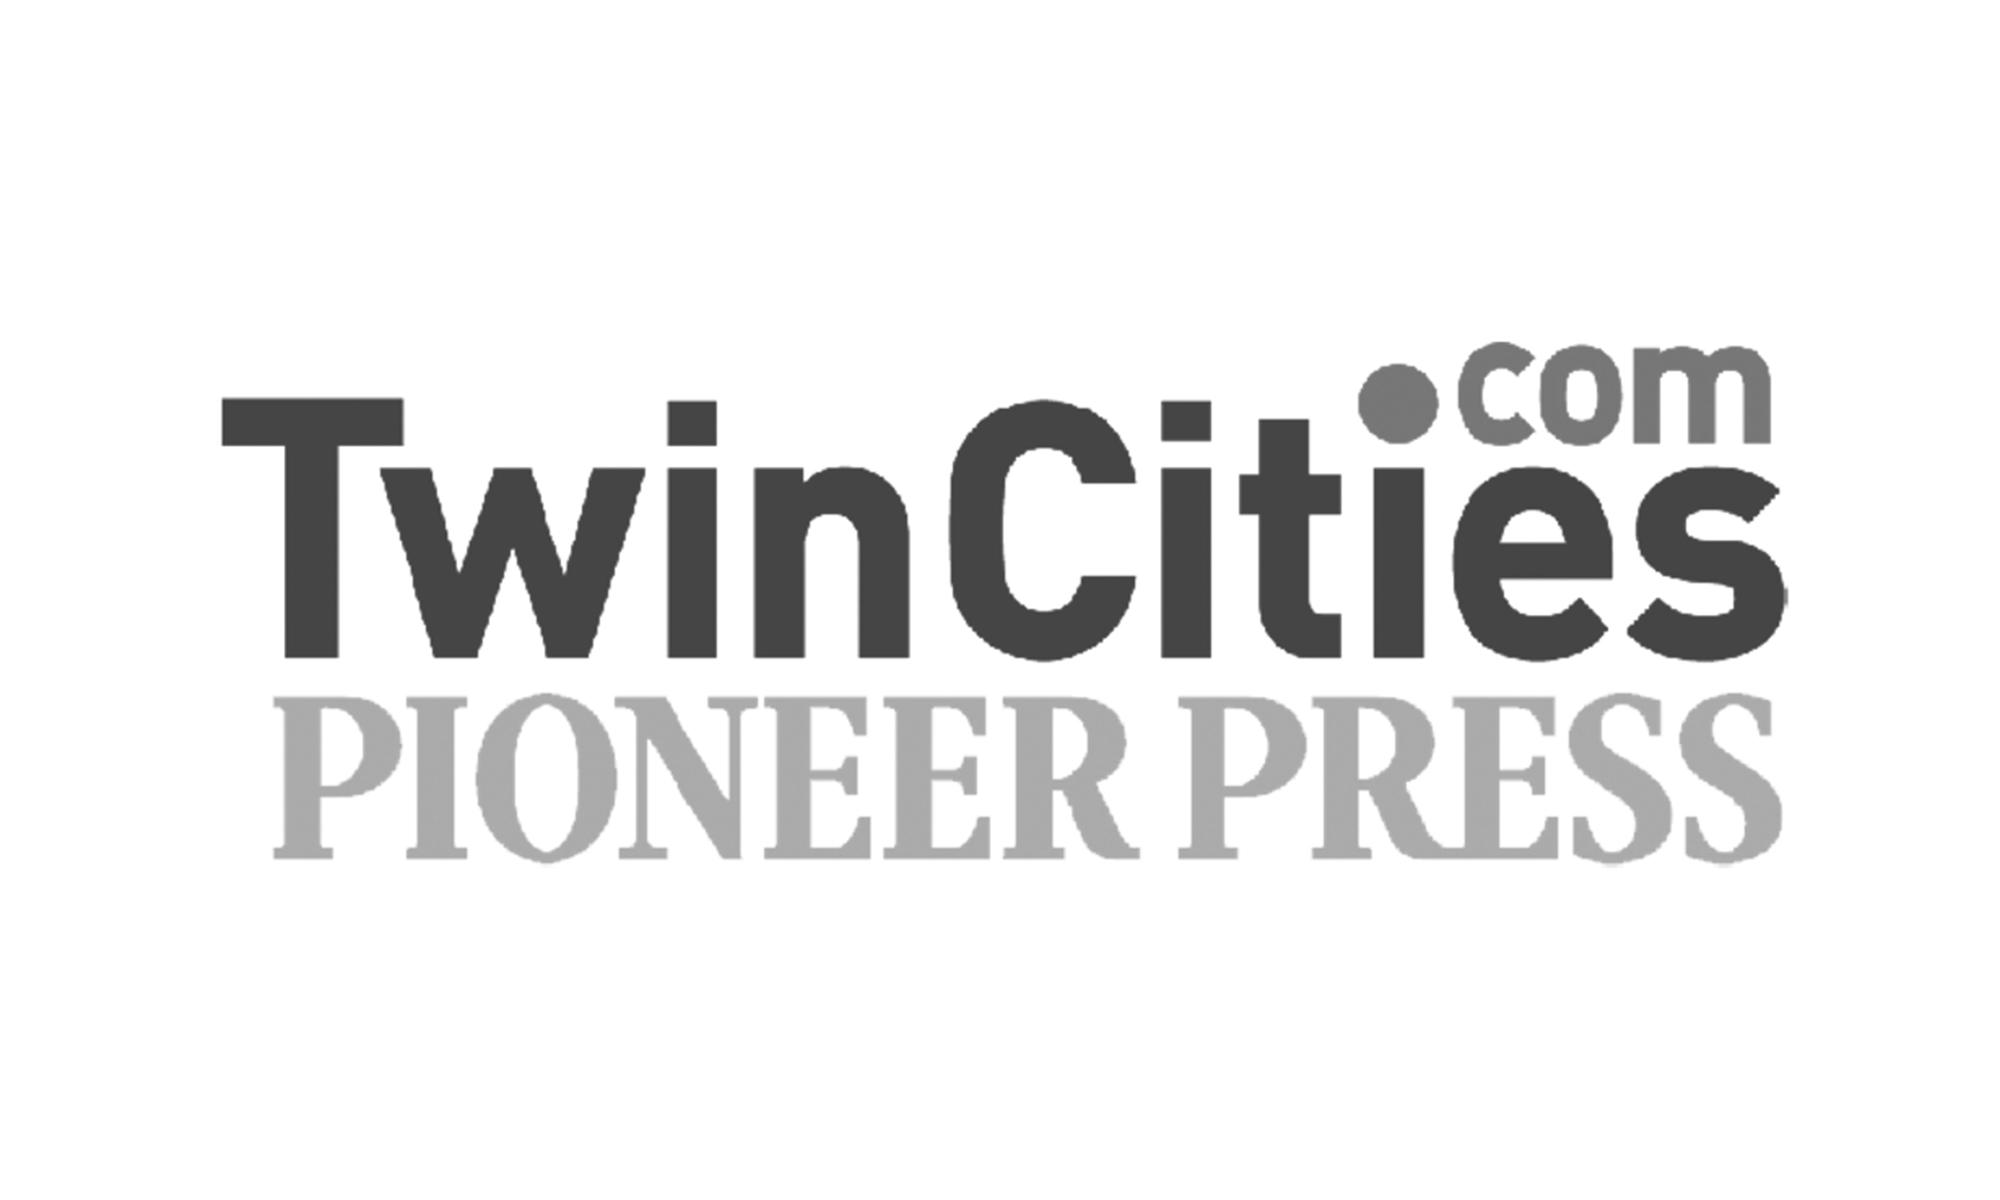 pioneer-press-twin-cities-logo.jpg